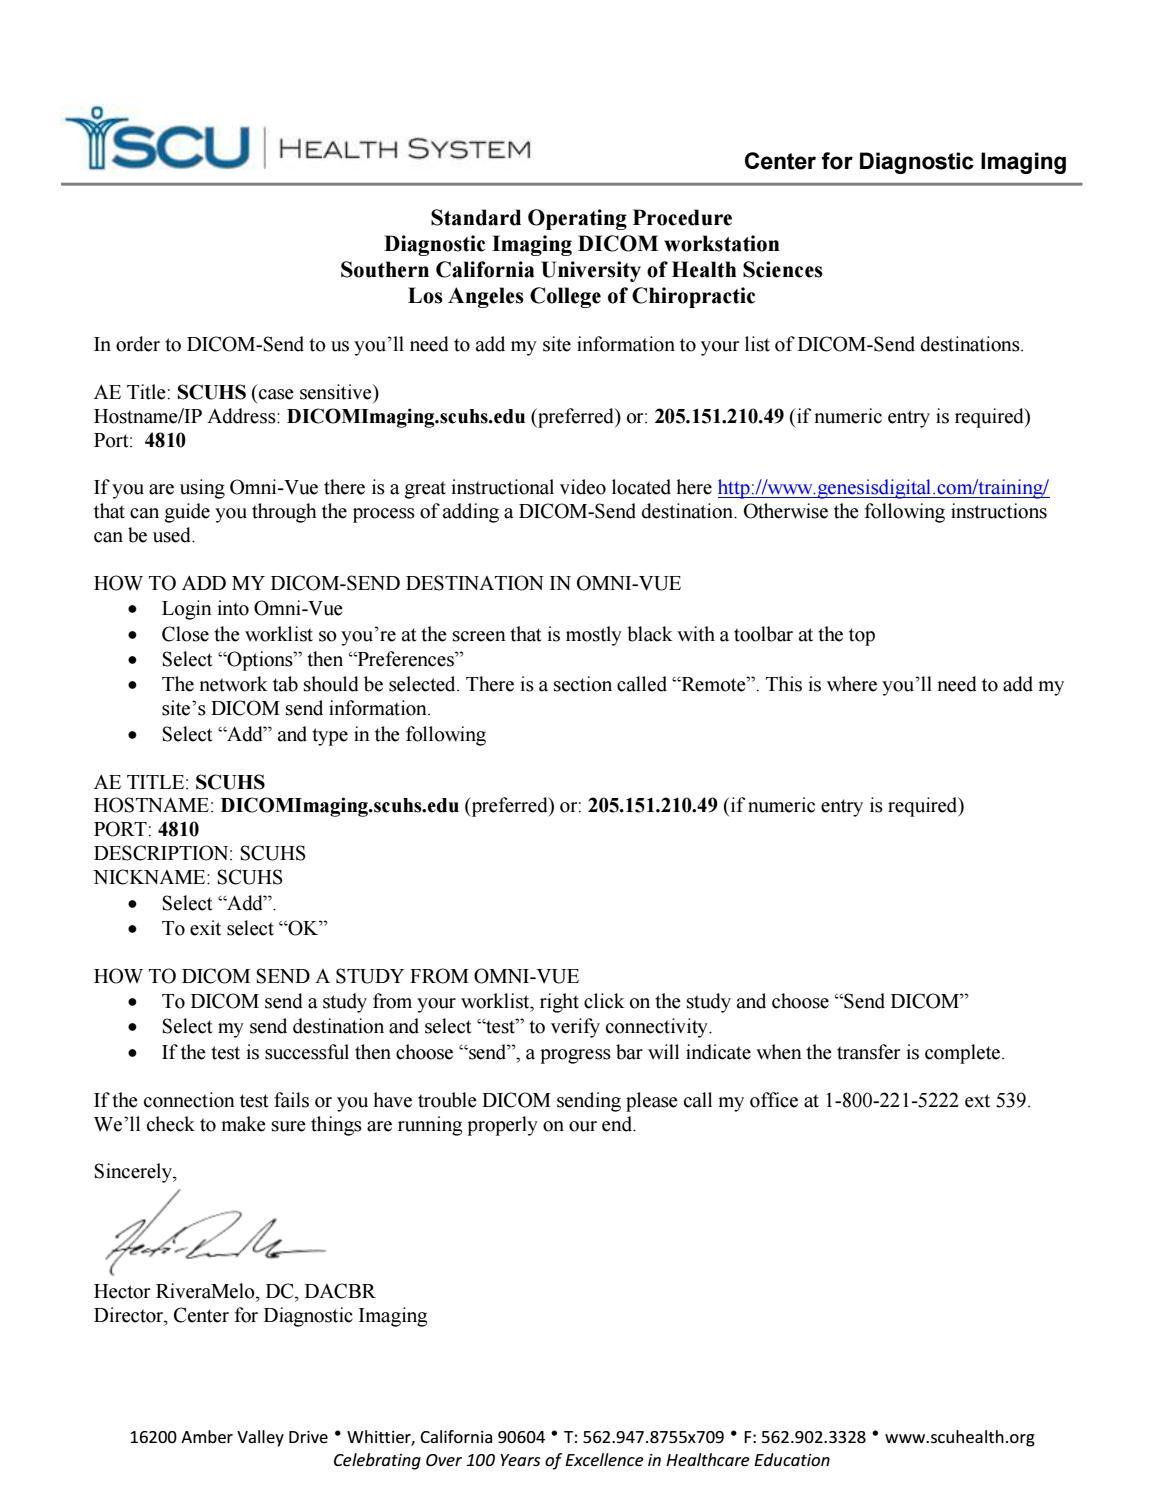 Dicom send instructions omnivue 2016 by Hector RiveraMelo - issuu